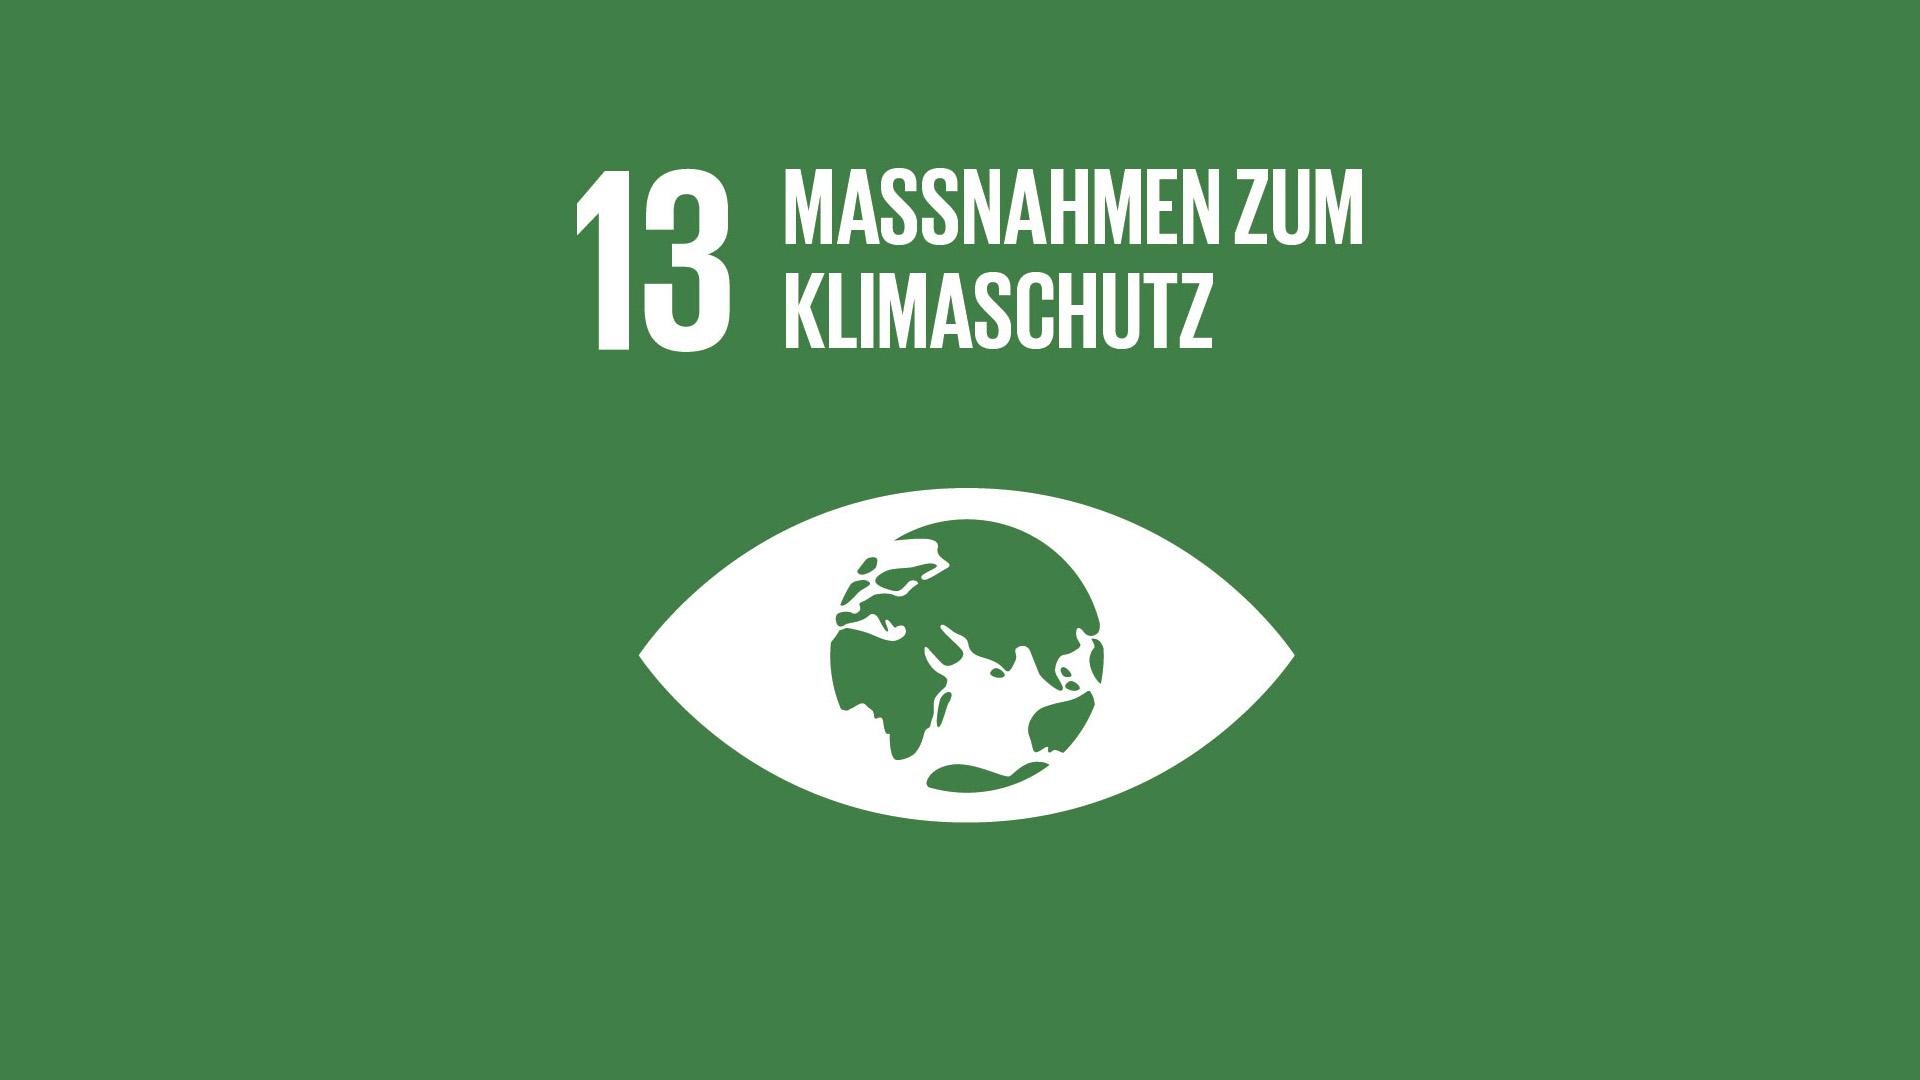 SDG 13: Maßnahmen zum Klimaschutz